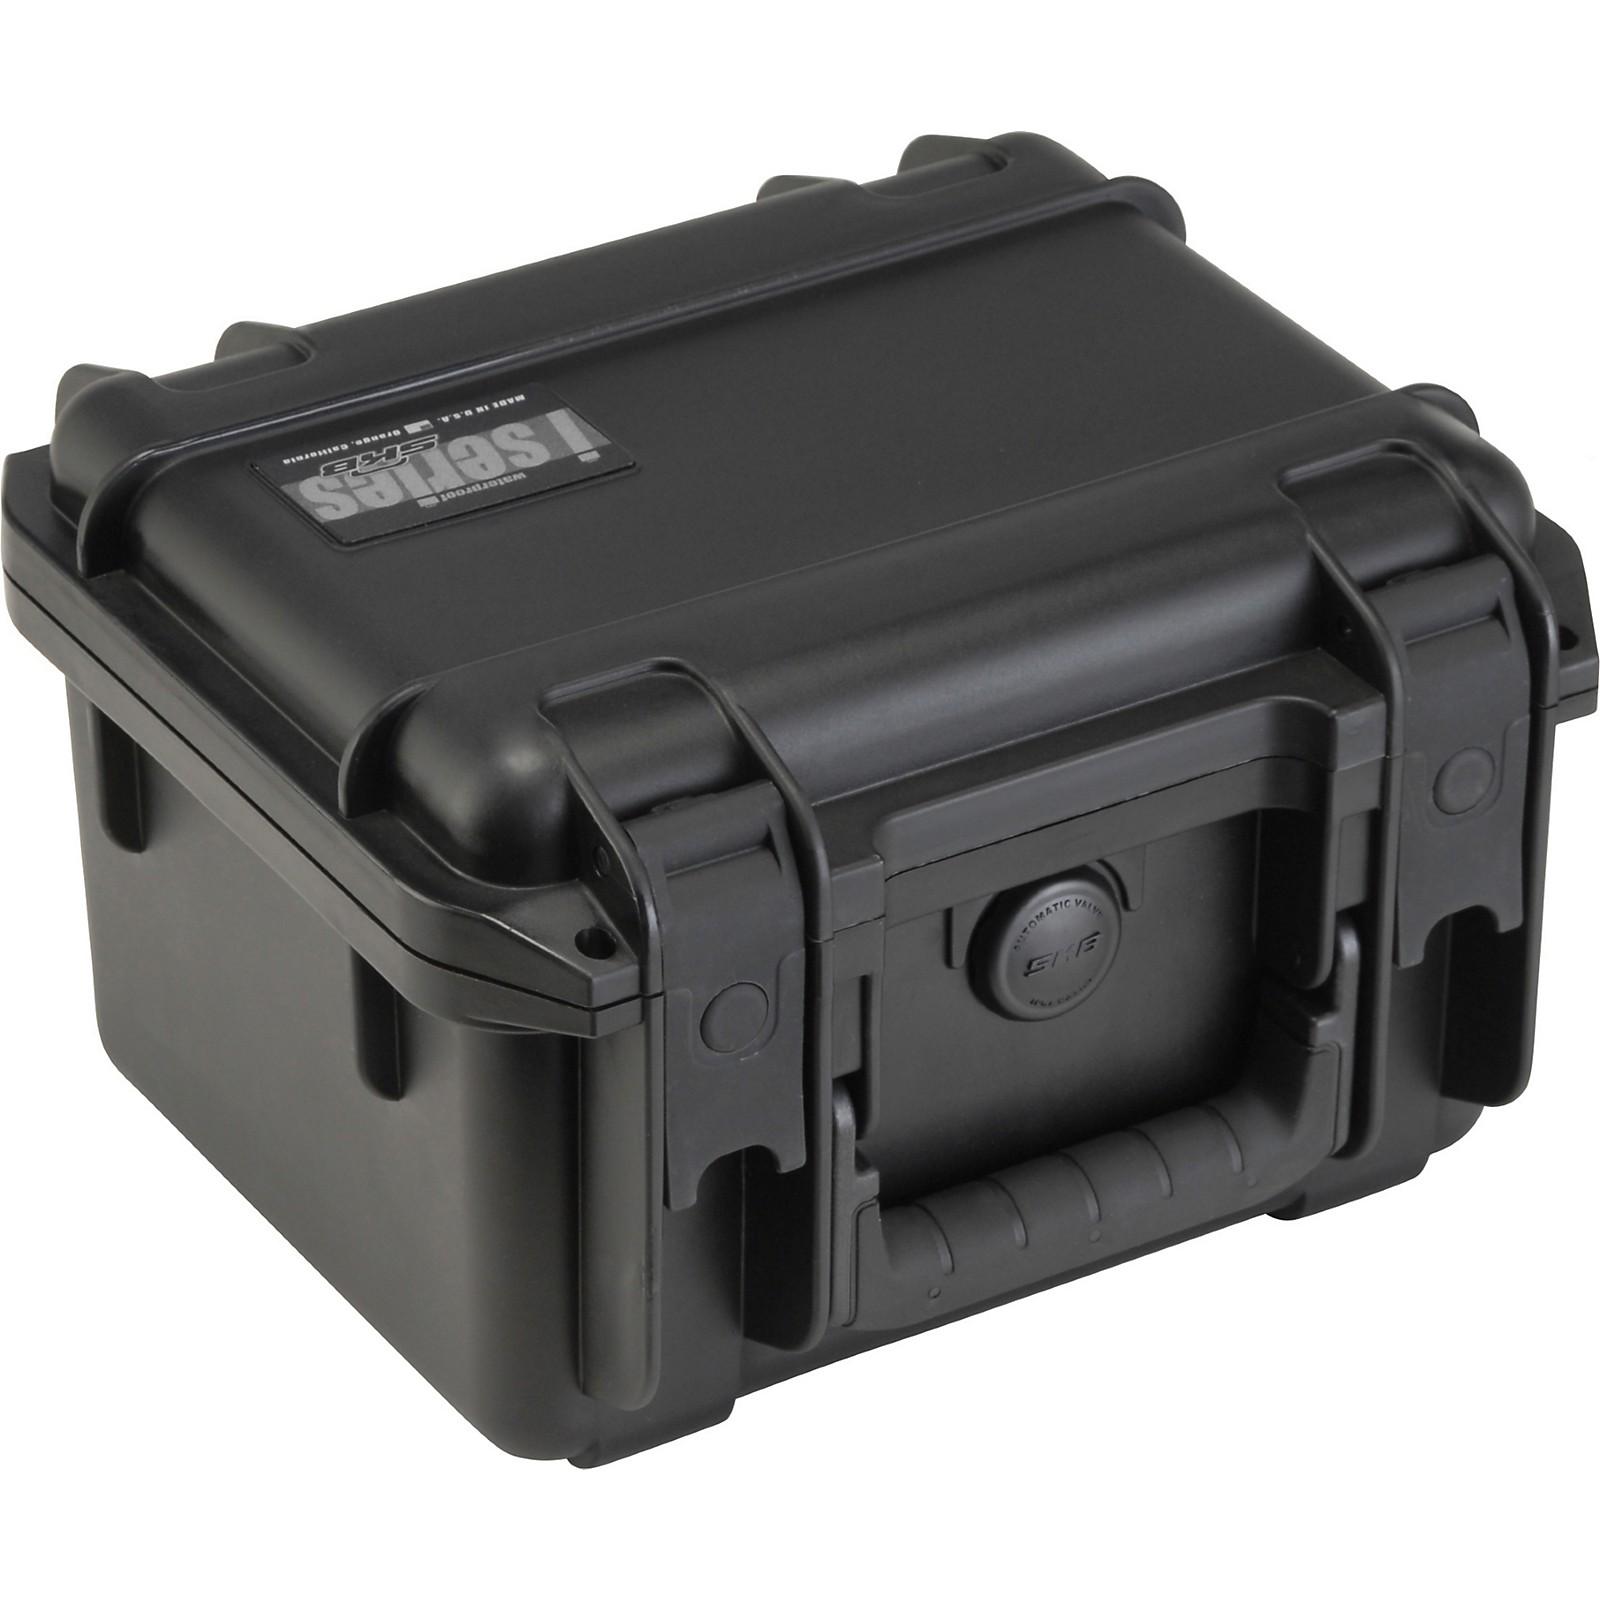 SKB 3i-0907-6B Military Standard Waterproof Case